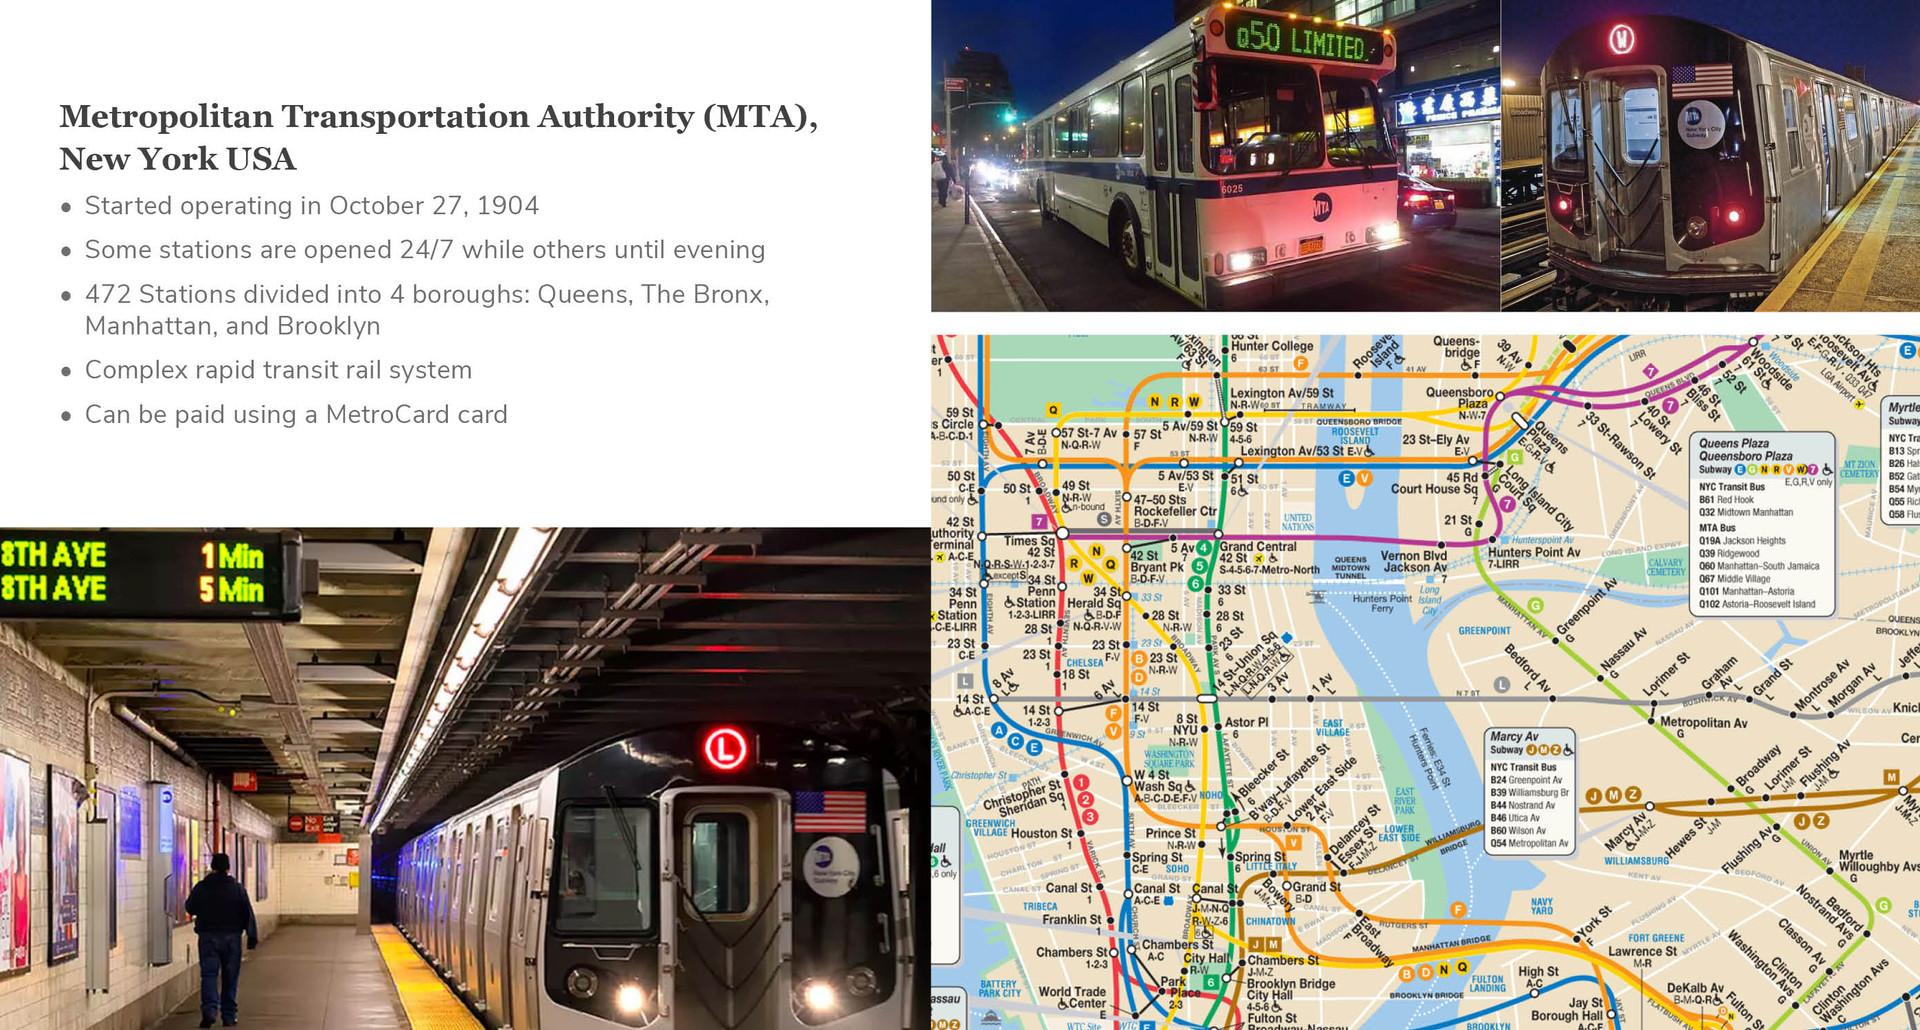 Metropolitan Transportation Authority (M